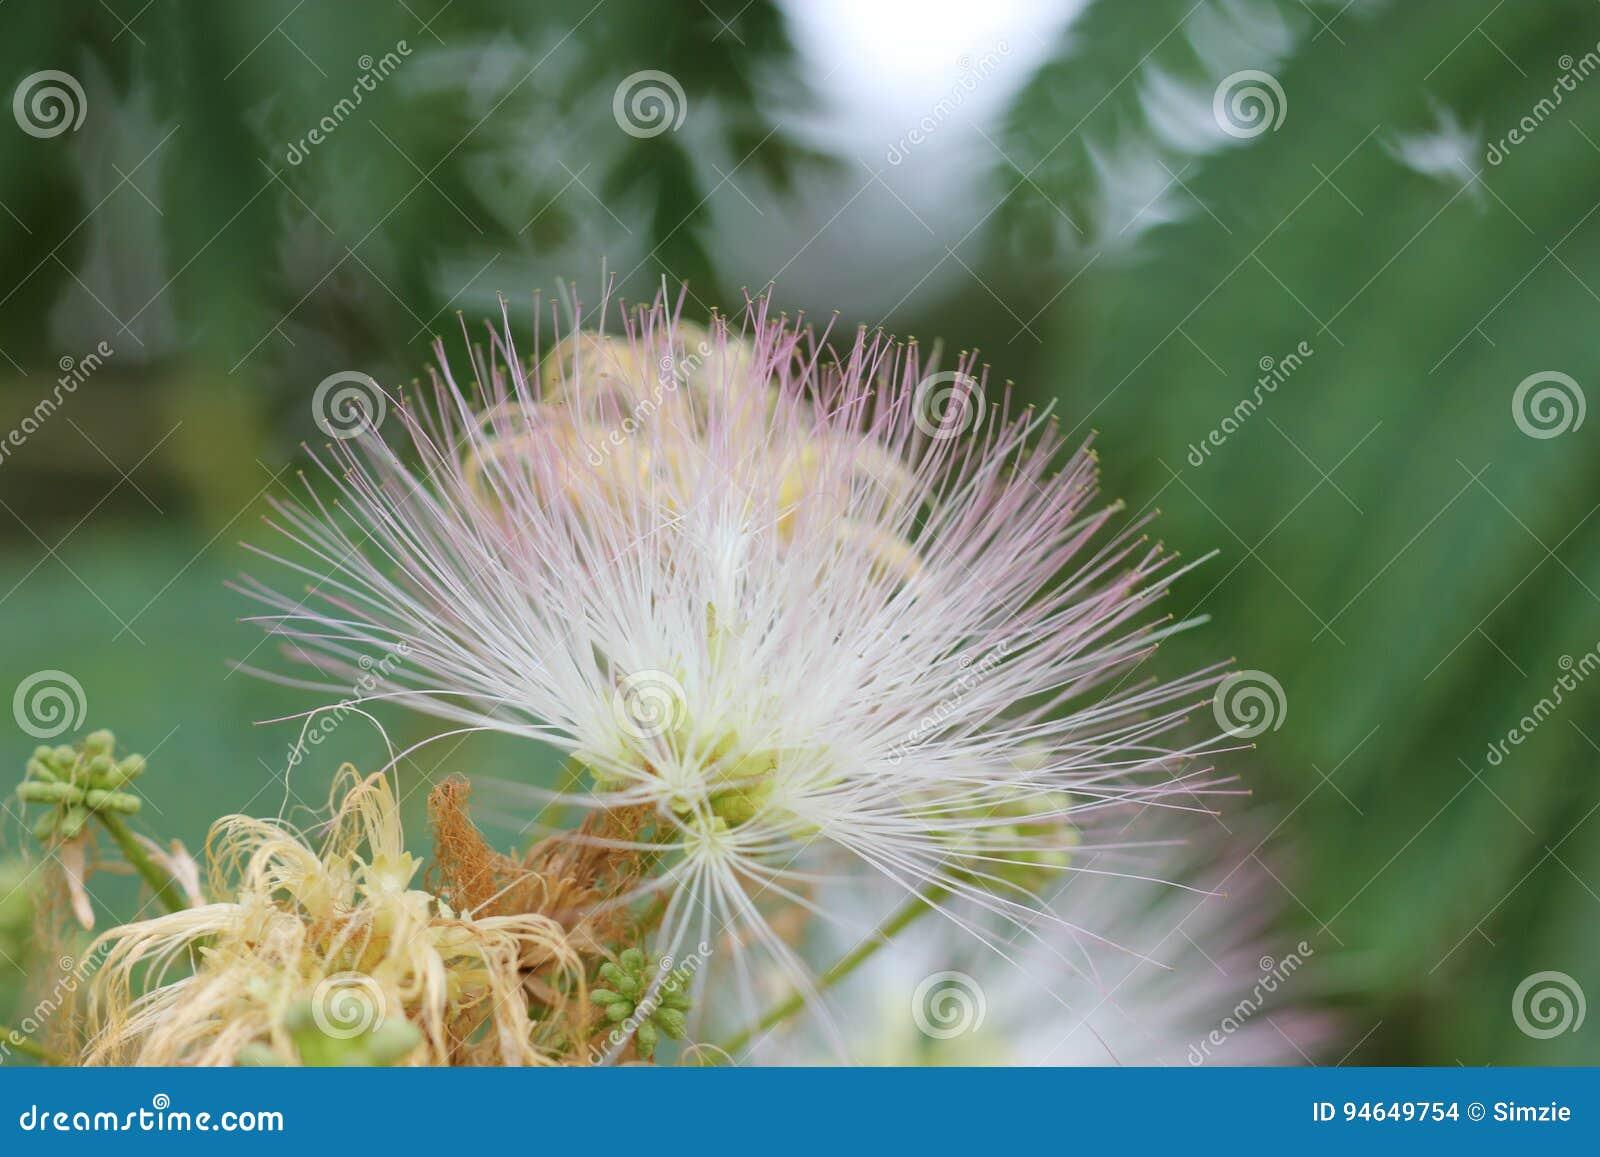 Narrow Dof Silk Tree Flower Stock Photo Image Of Flower Silk